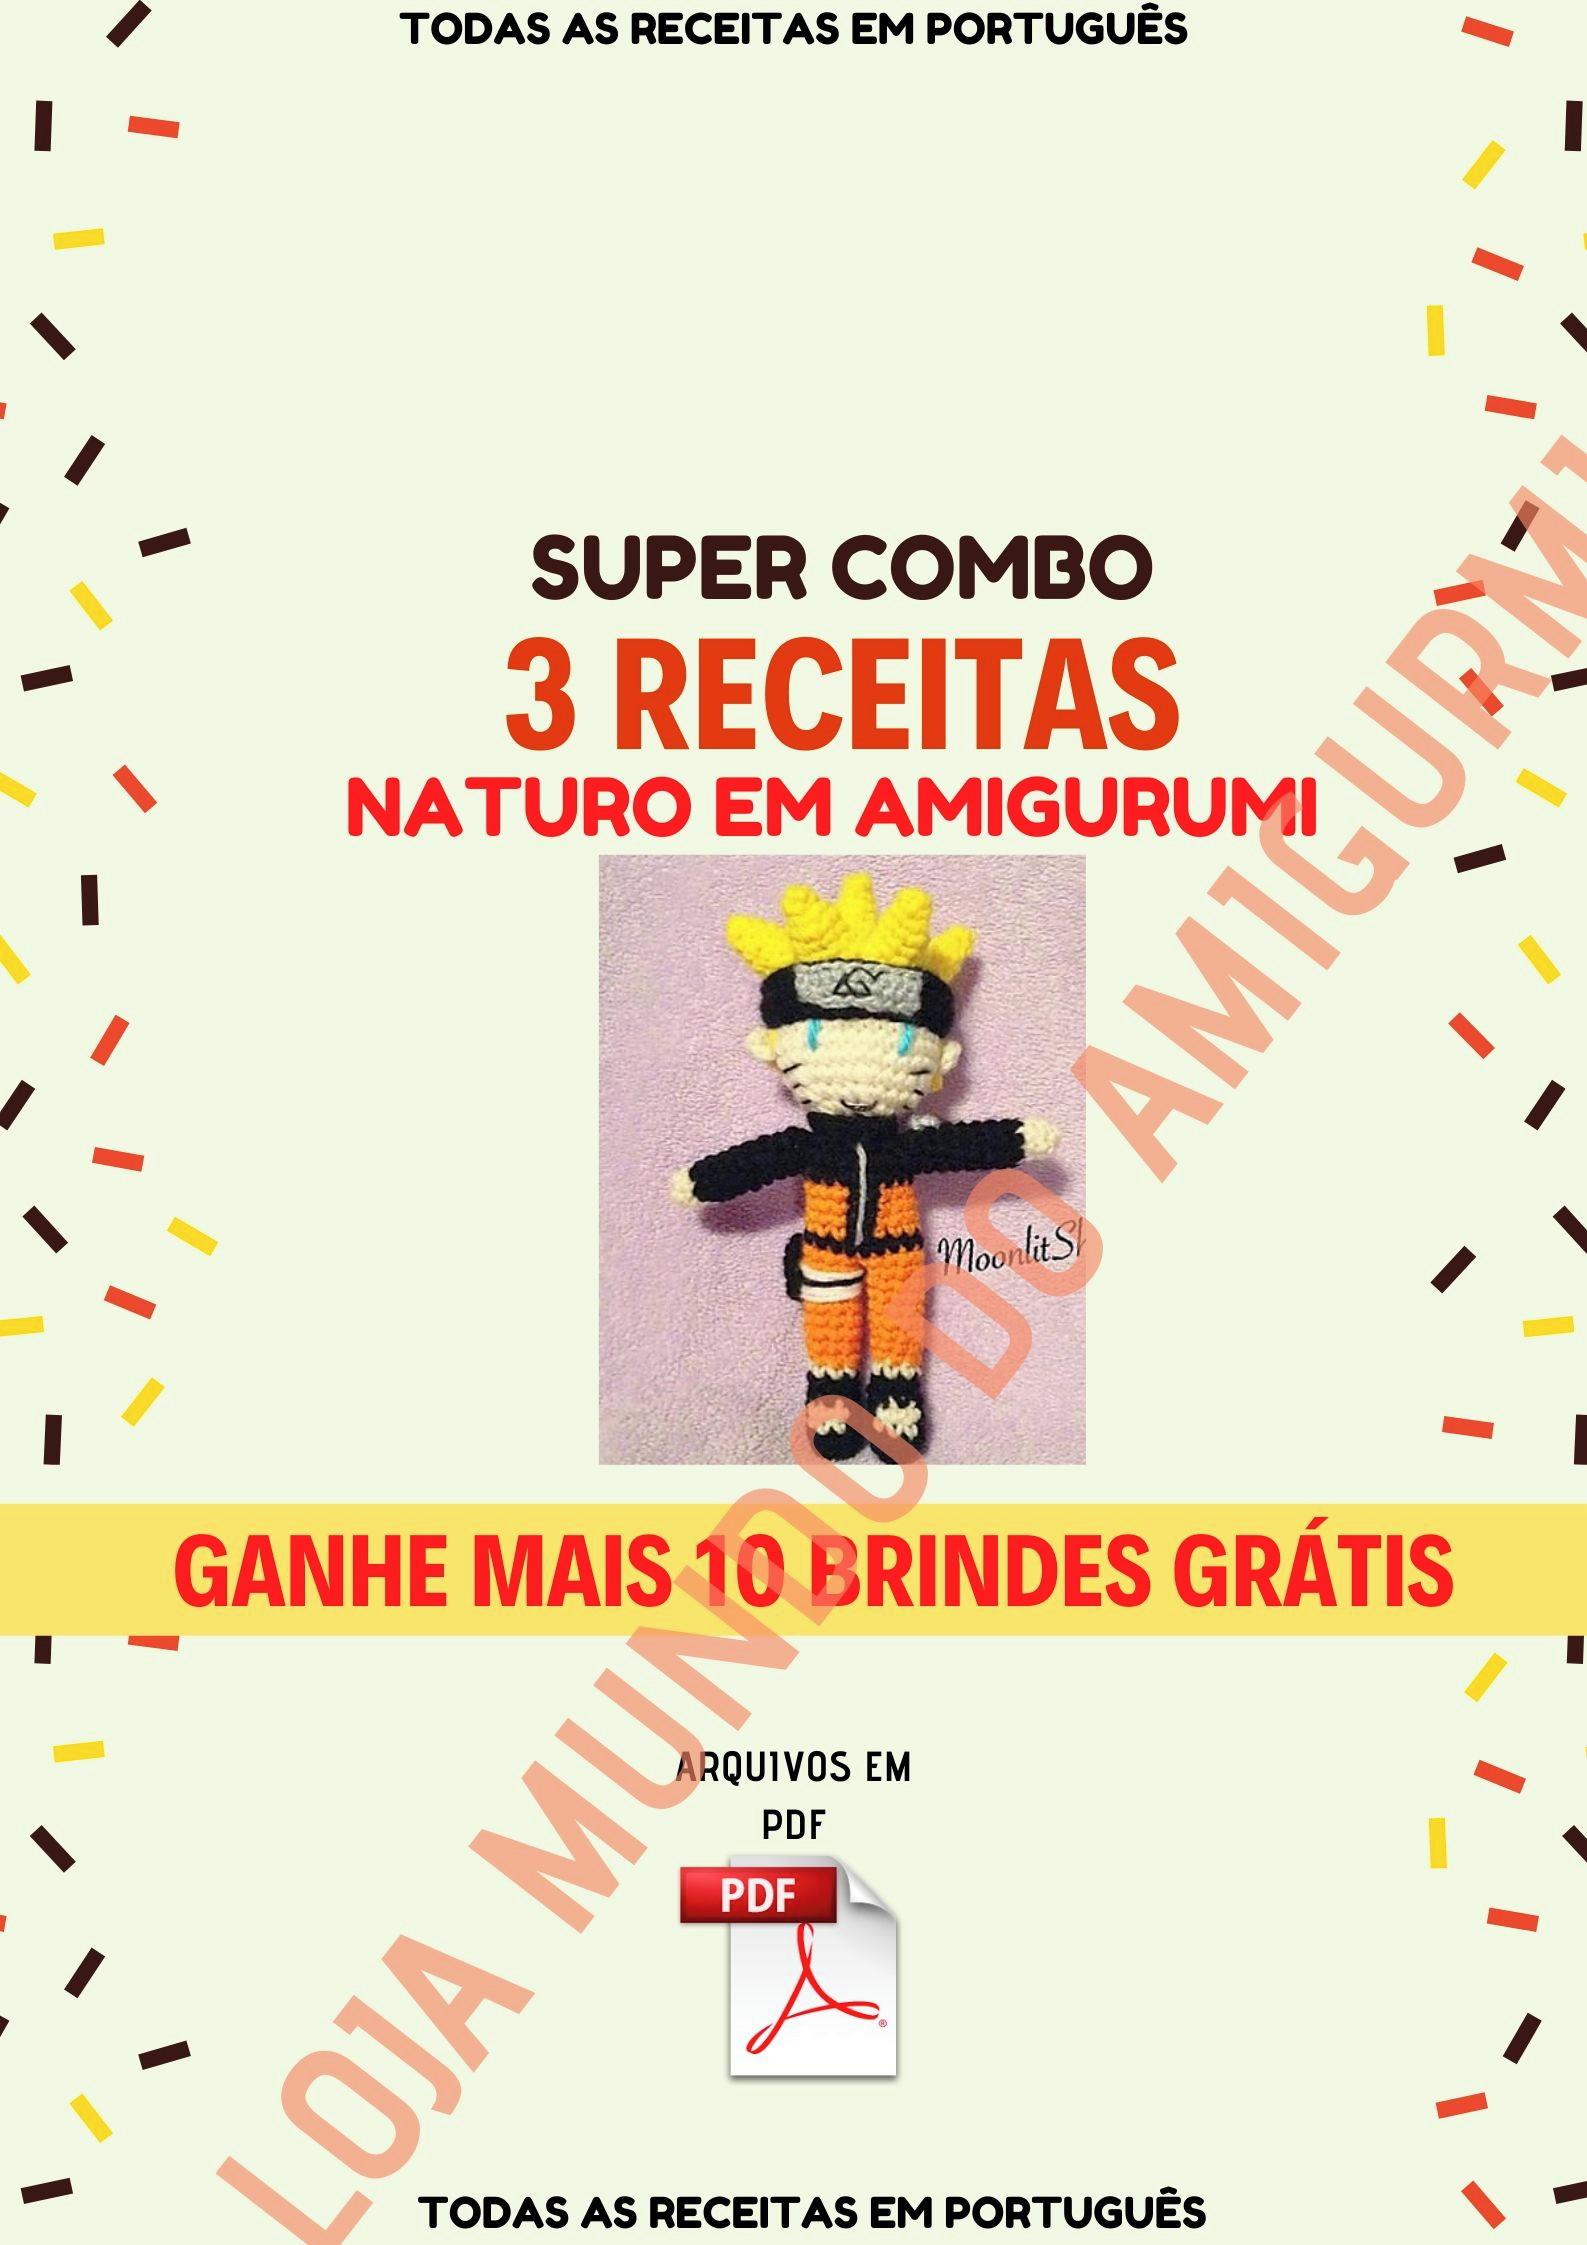 Mega Combo 16 Receitas Amigurumi Pokemóns Em Português no Elo7 ...   2245x1587